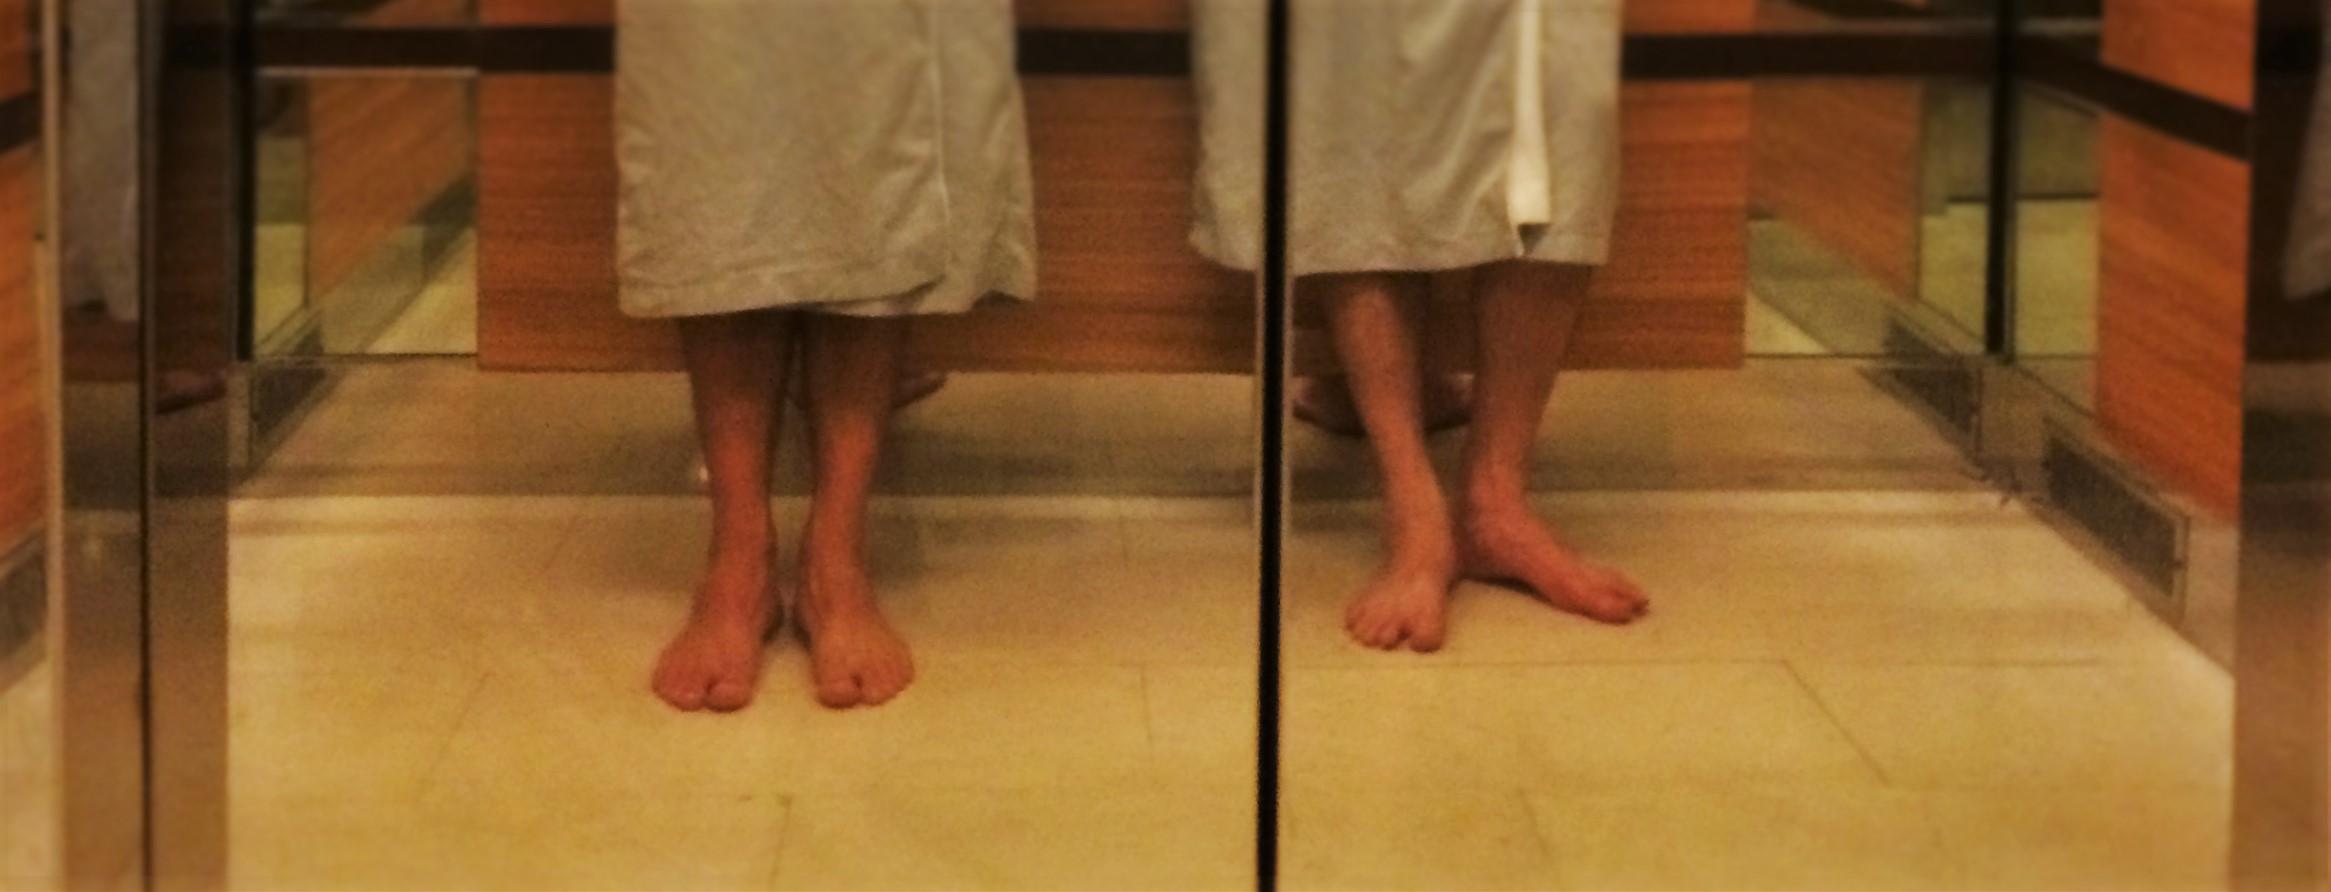 Feet in Elevator at Hyatt Olive 8 Seattle header